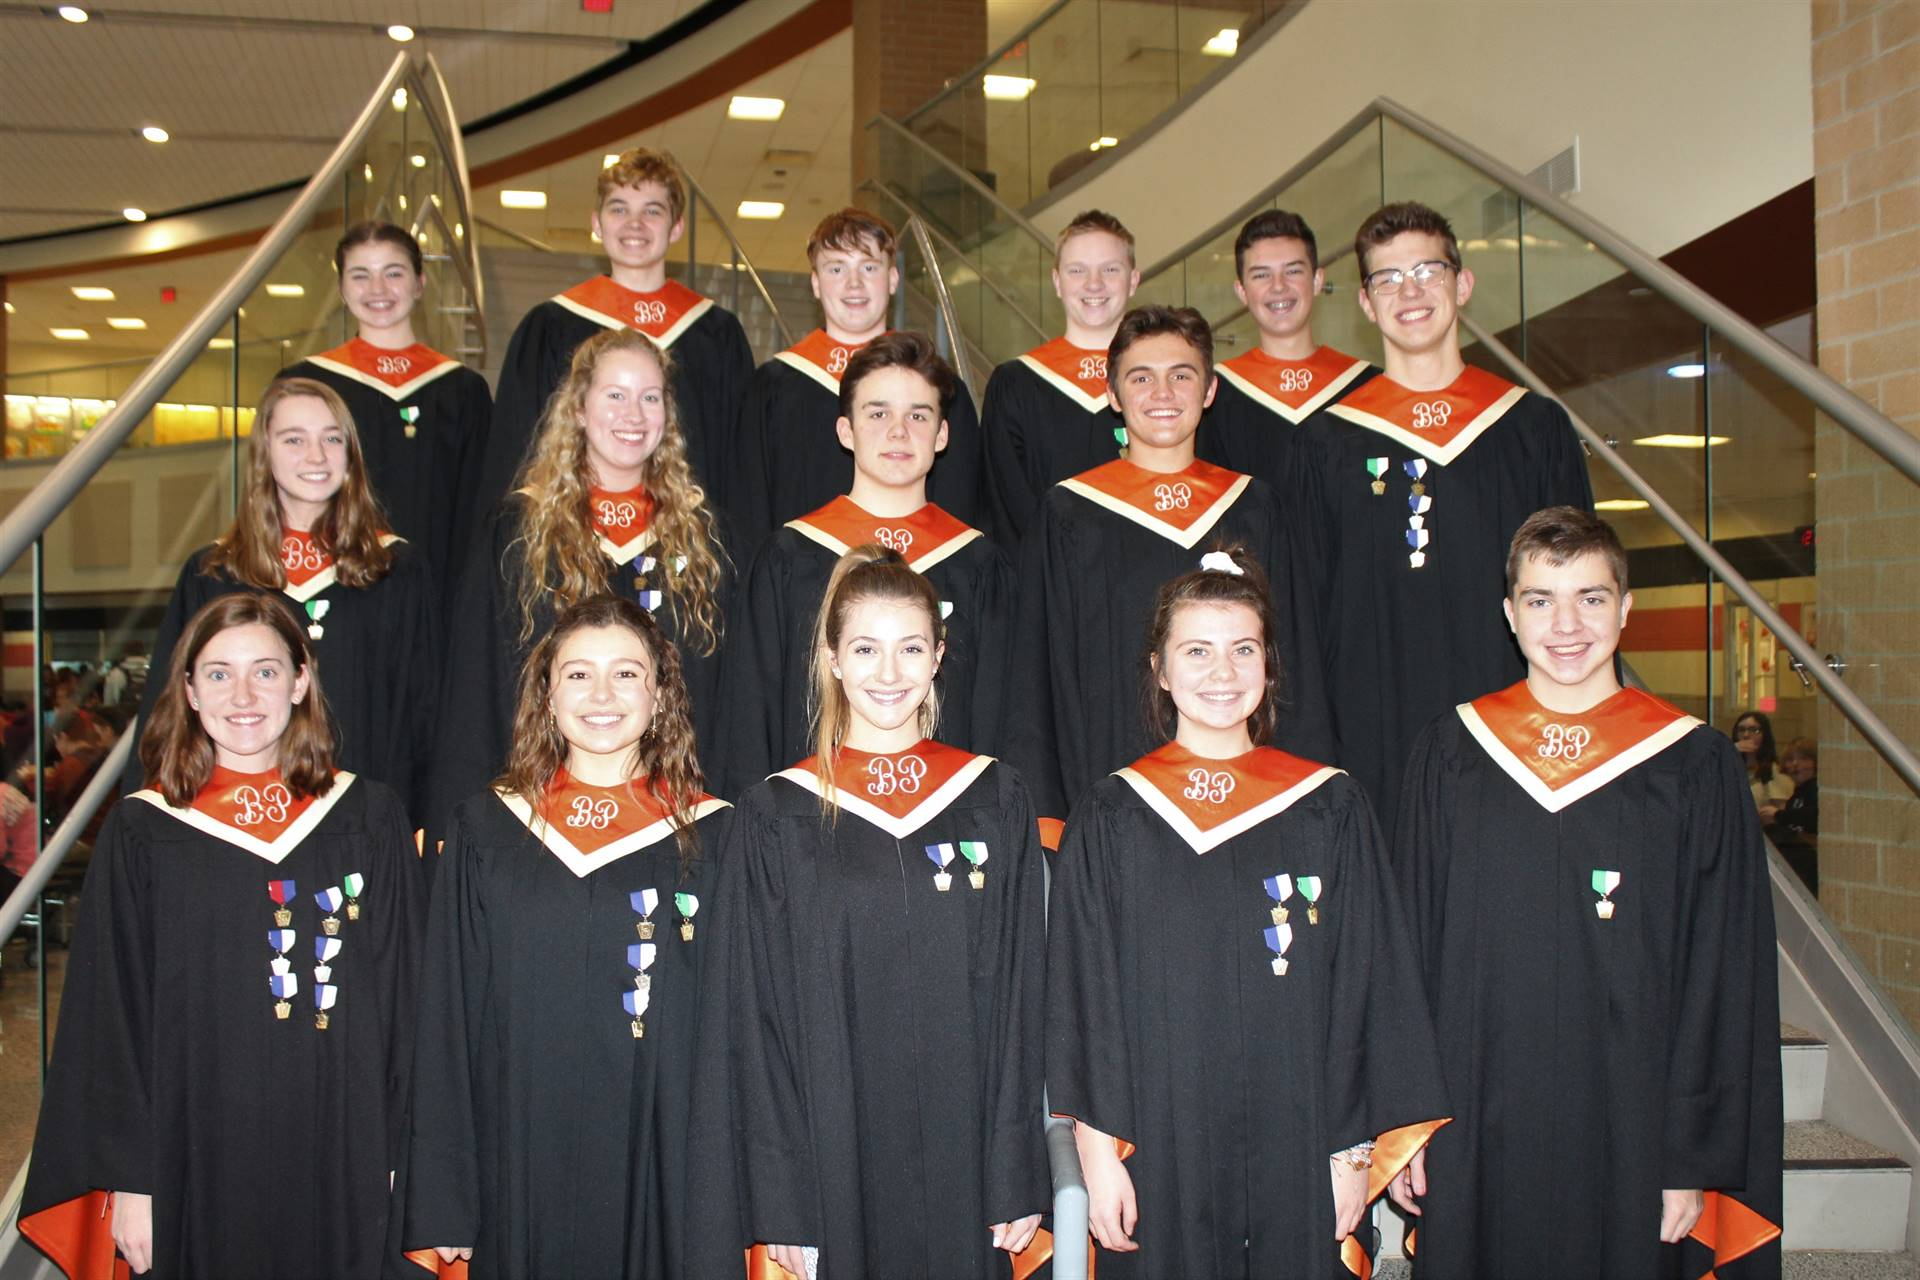 The 15 BPHS Region Chorus students